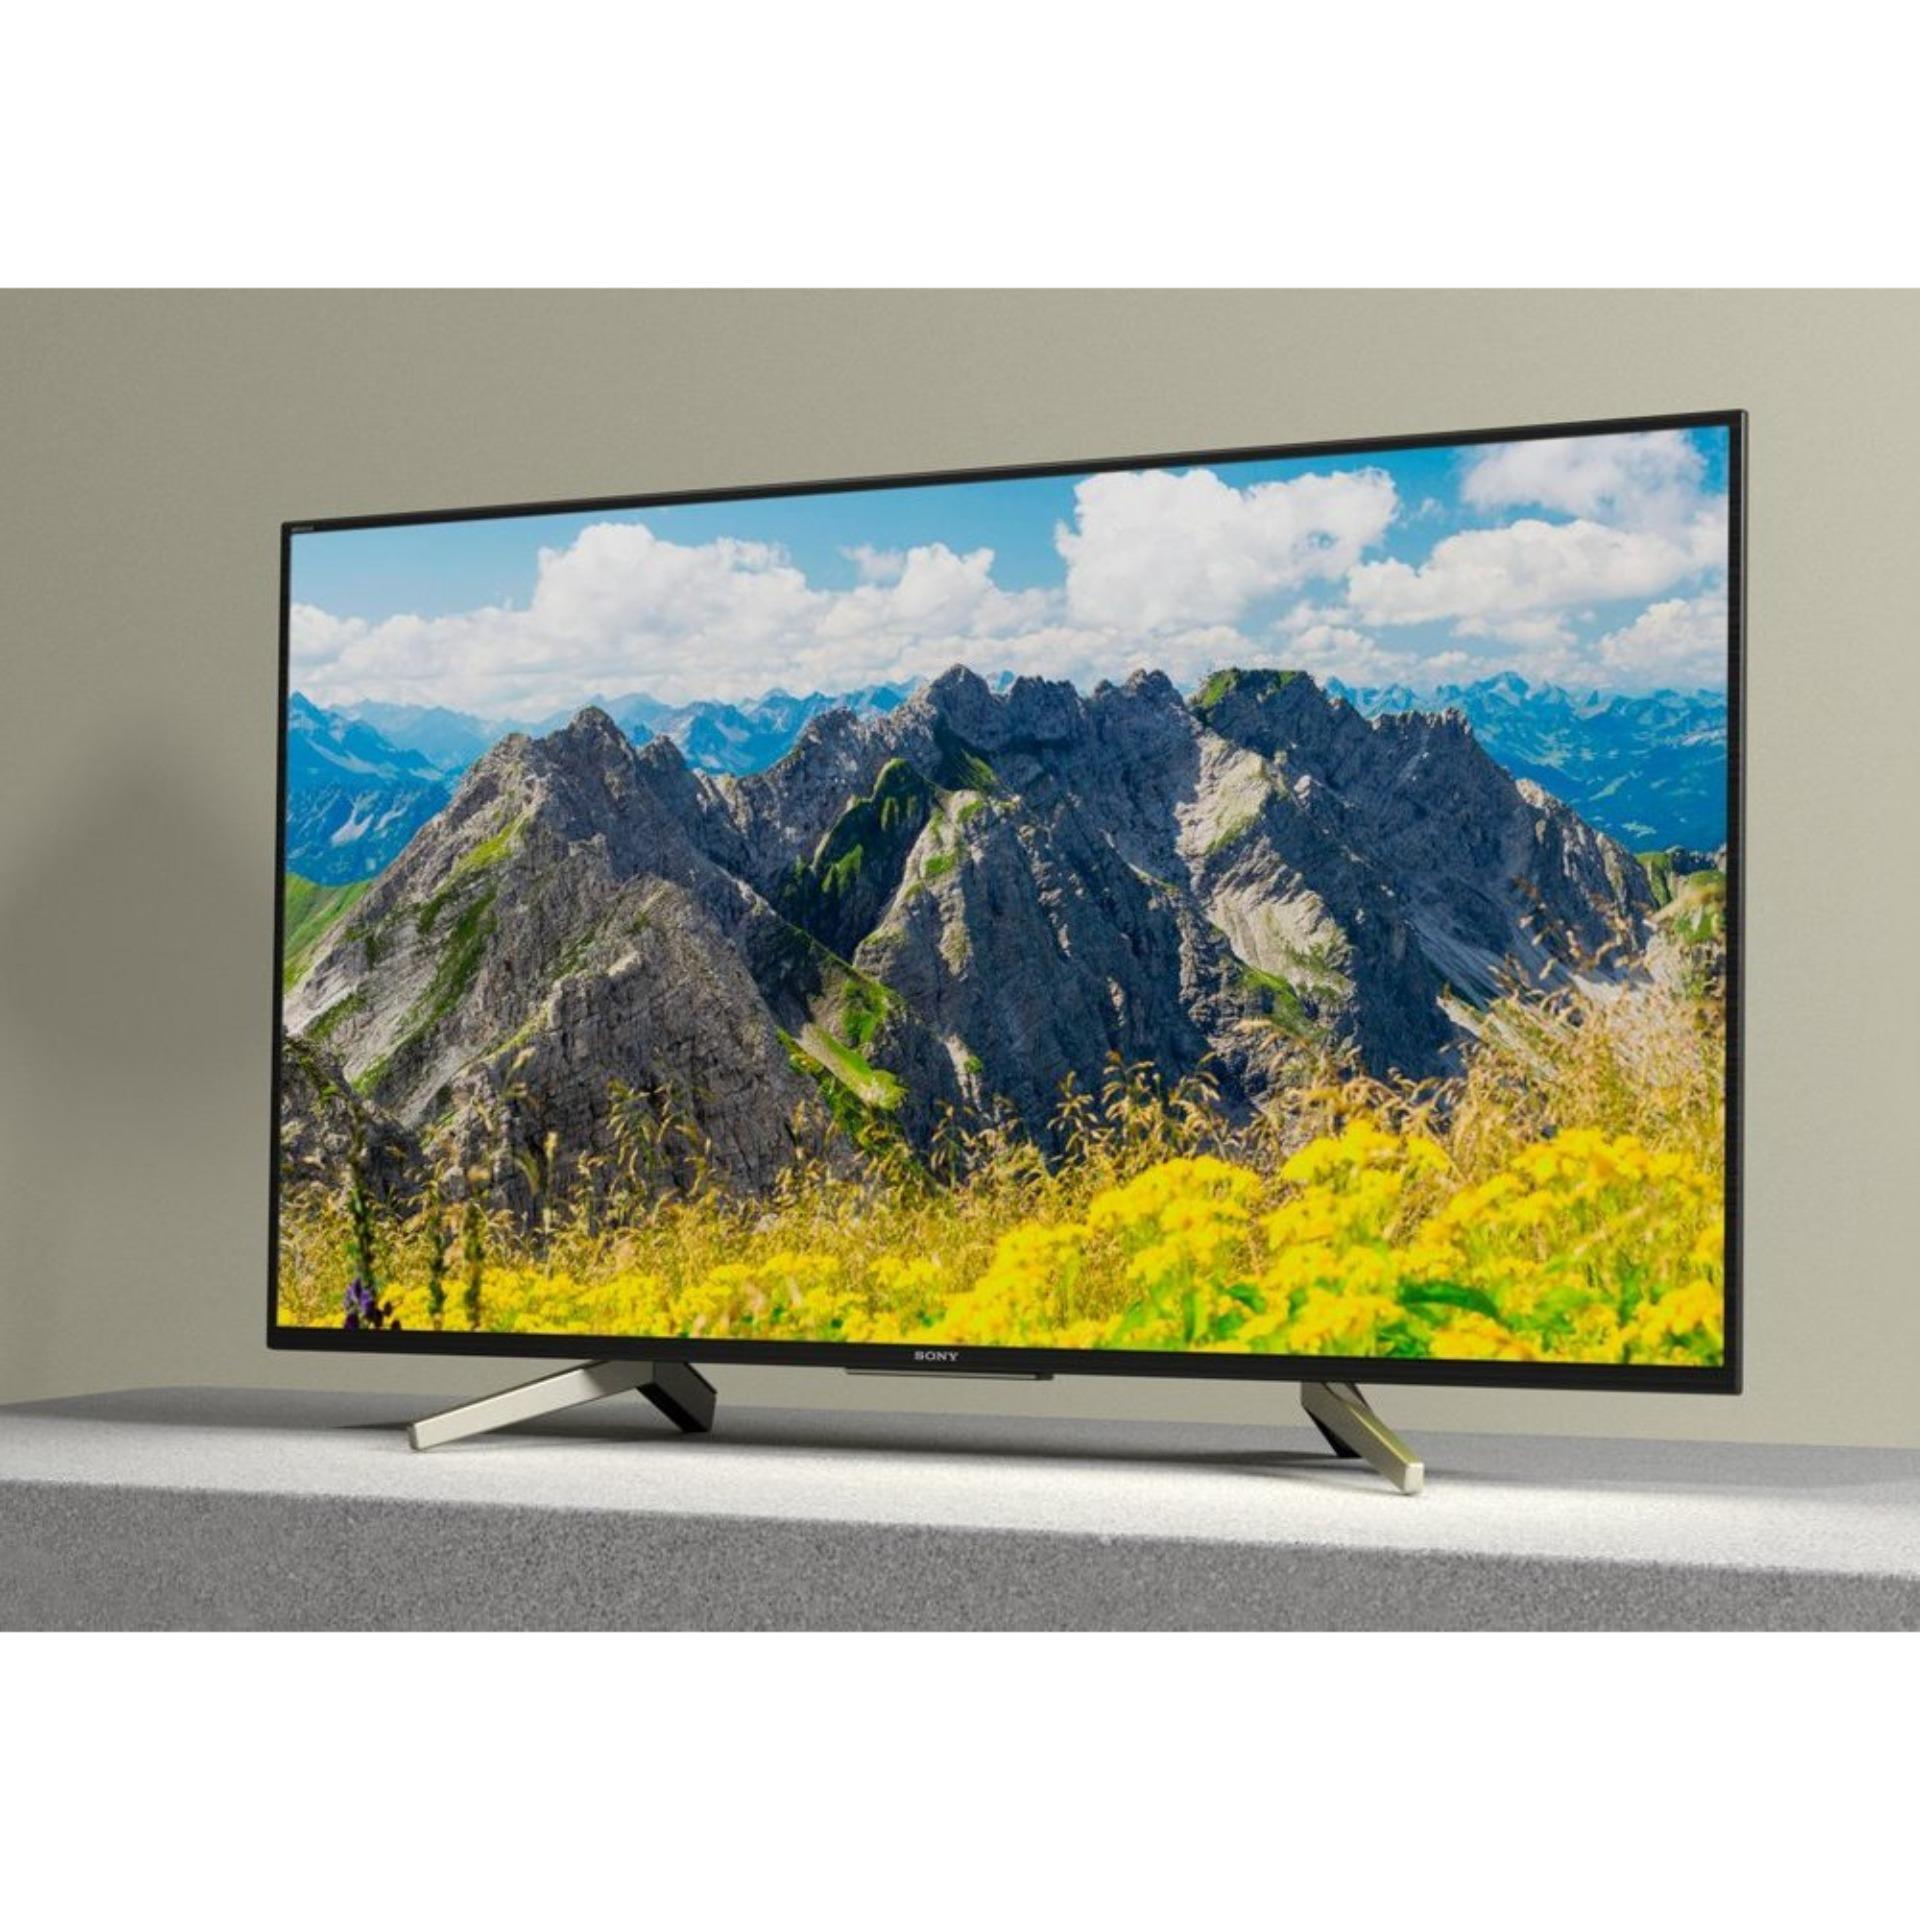 Tech Tuesday Televisi Hot Deals Samsung Ua32j4003 Tv Led 32 Inch Sony 43 Uhd Smart 43x7500f Khusus Jadetabek